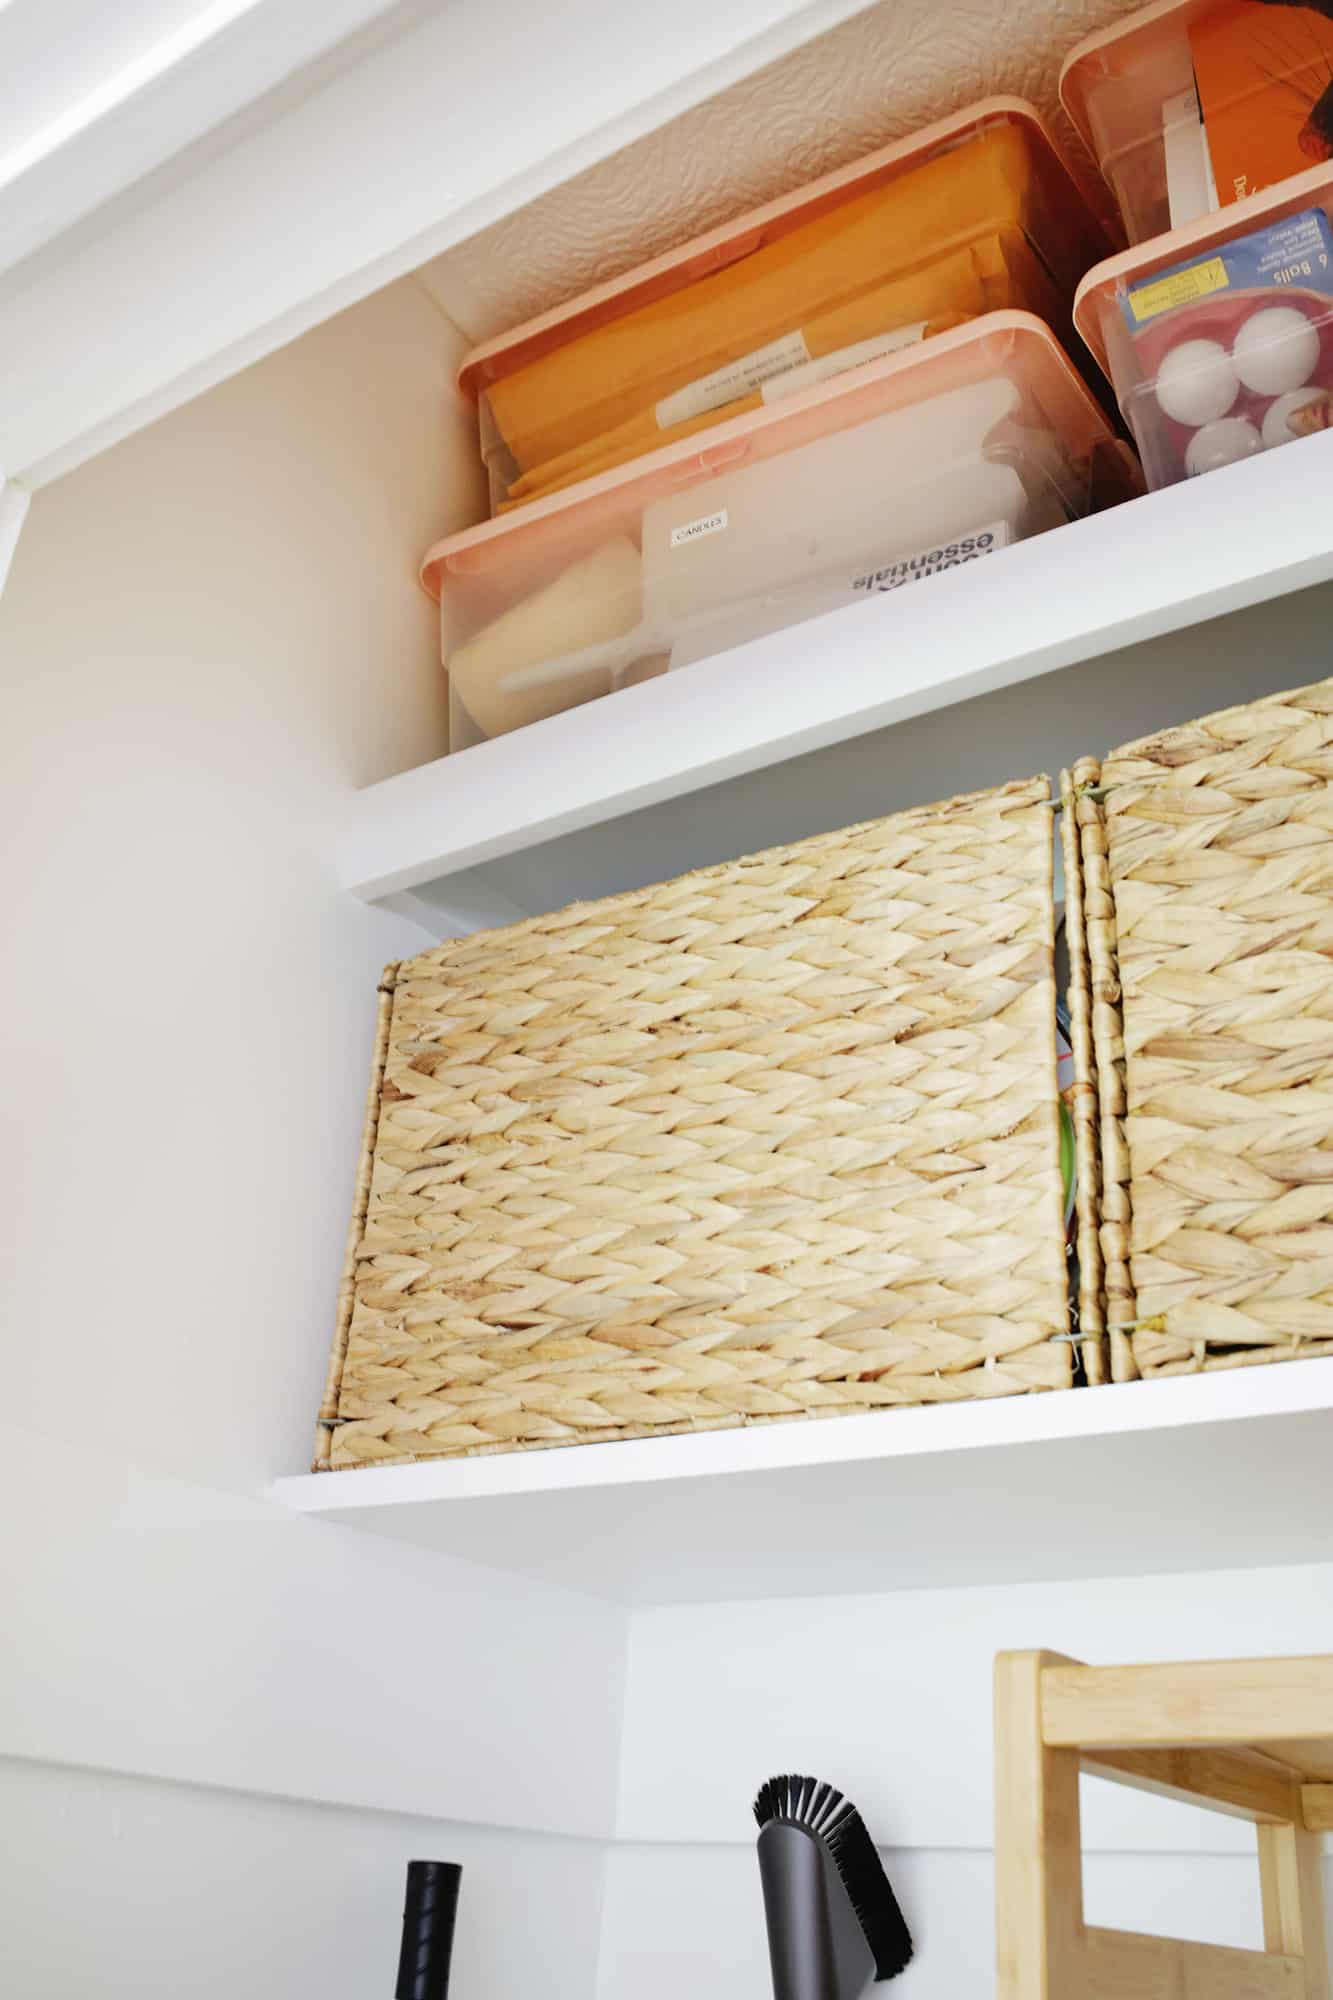 Storage boxes on a shelf